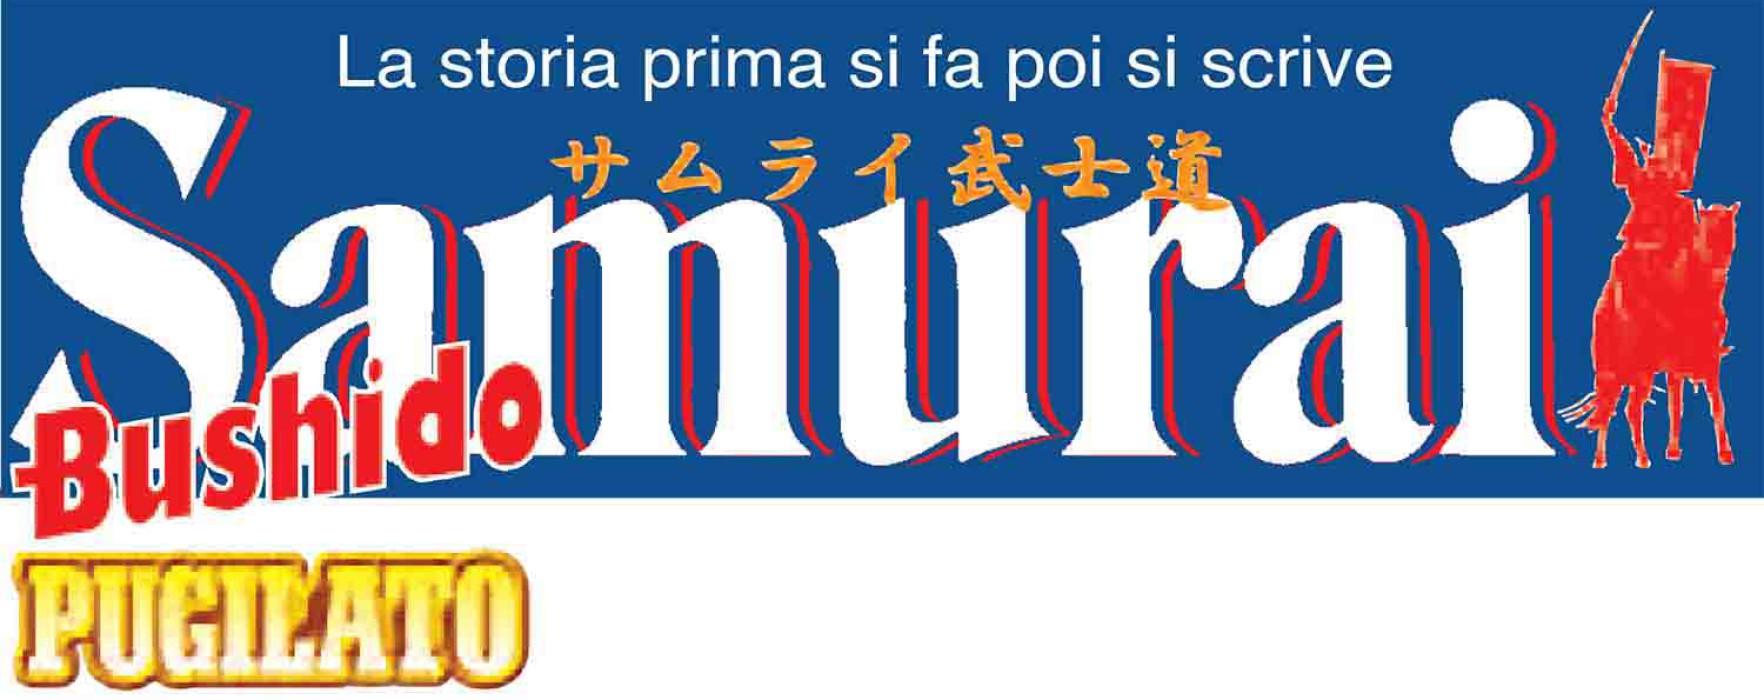 Mathias Gallo Cassarino interviewed by Italian magazine Samurai Bushido